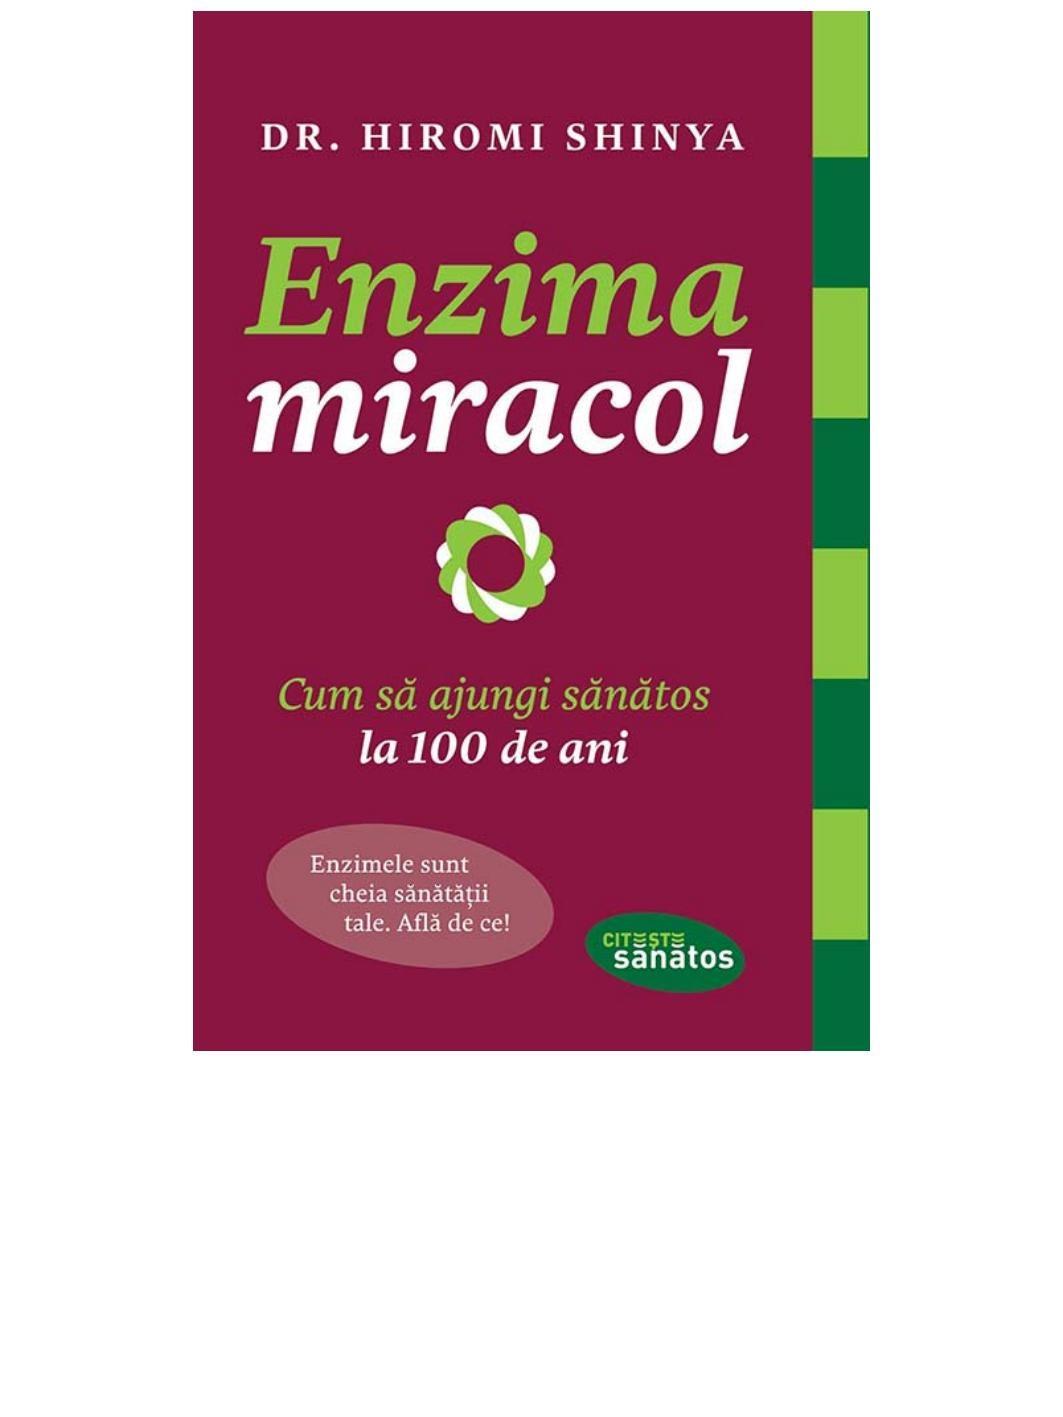 Impotenta masculina vindecare ed remedii casnice, evaluation of the...